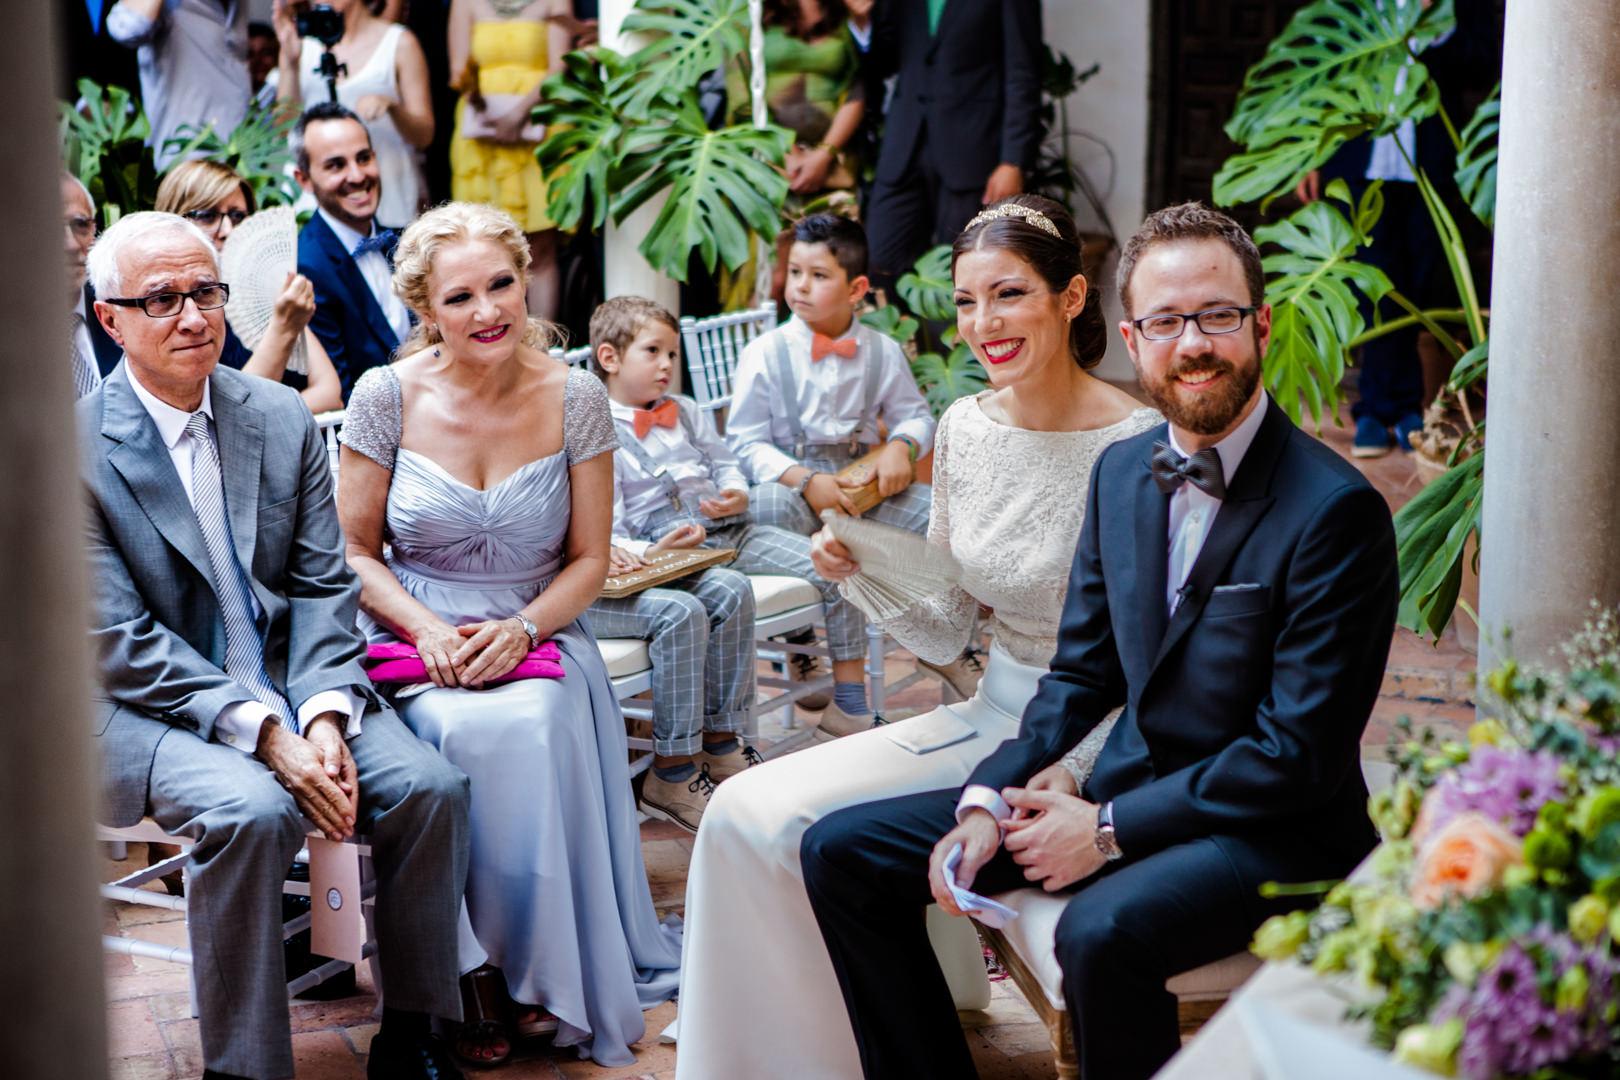 Boda-Sevilla-Museo-Carmona-Hamburgo-Maria-Carles-engagement-Rafael-Torres-fotografo-bodas-sevilla-madrid-barcelona-wedding-photographer--21.jpg